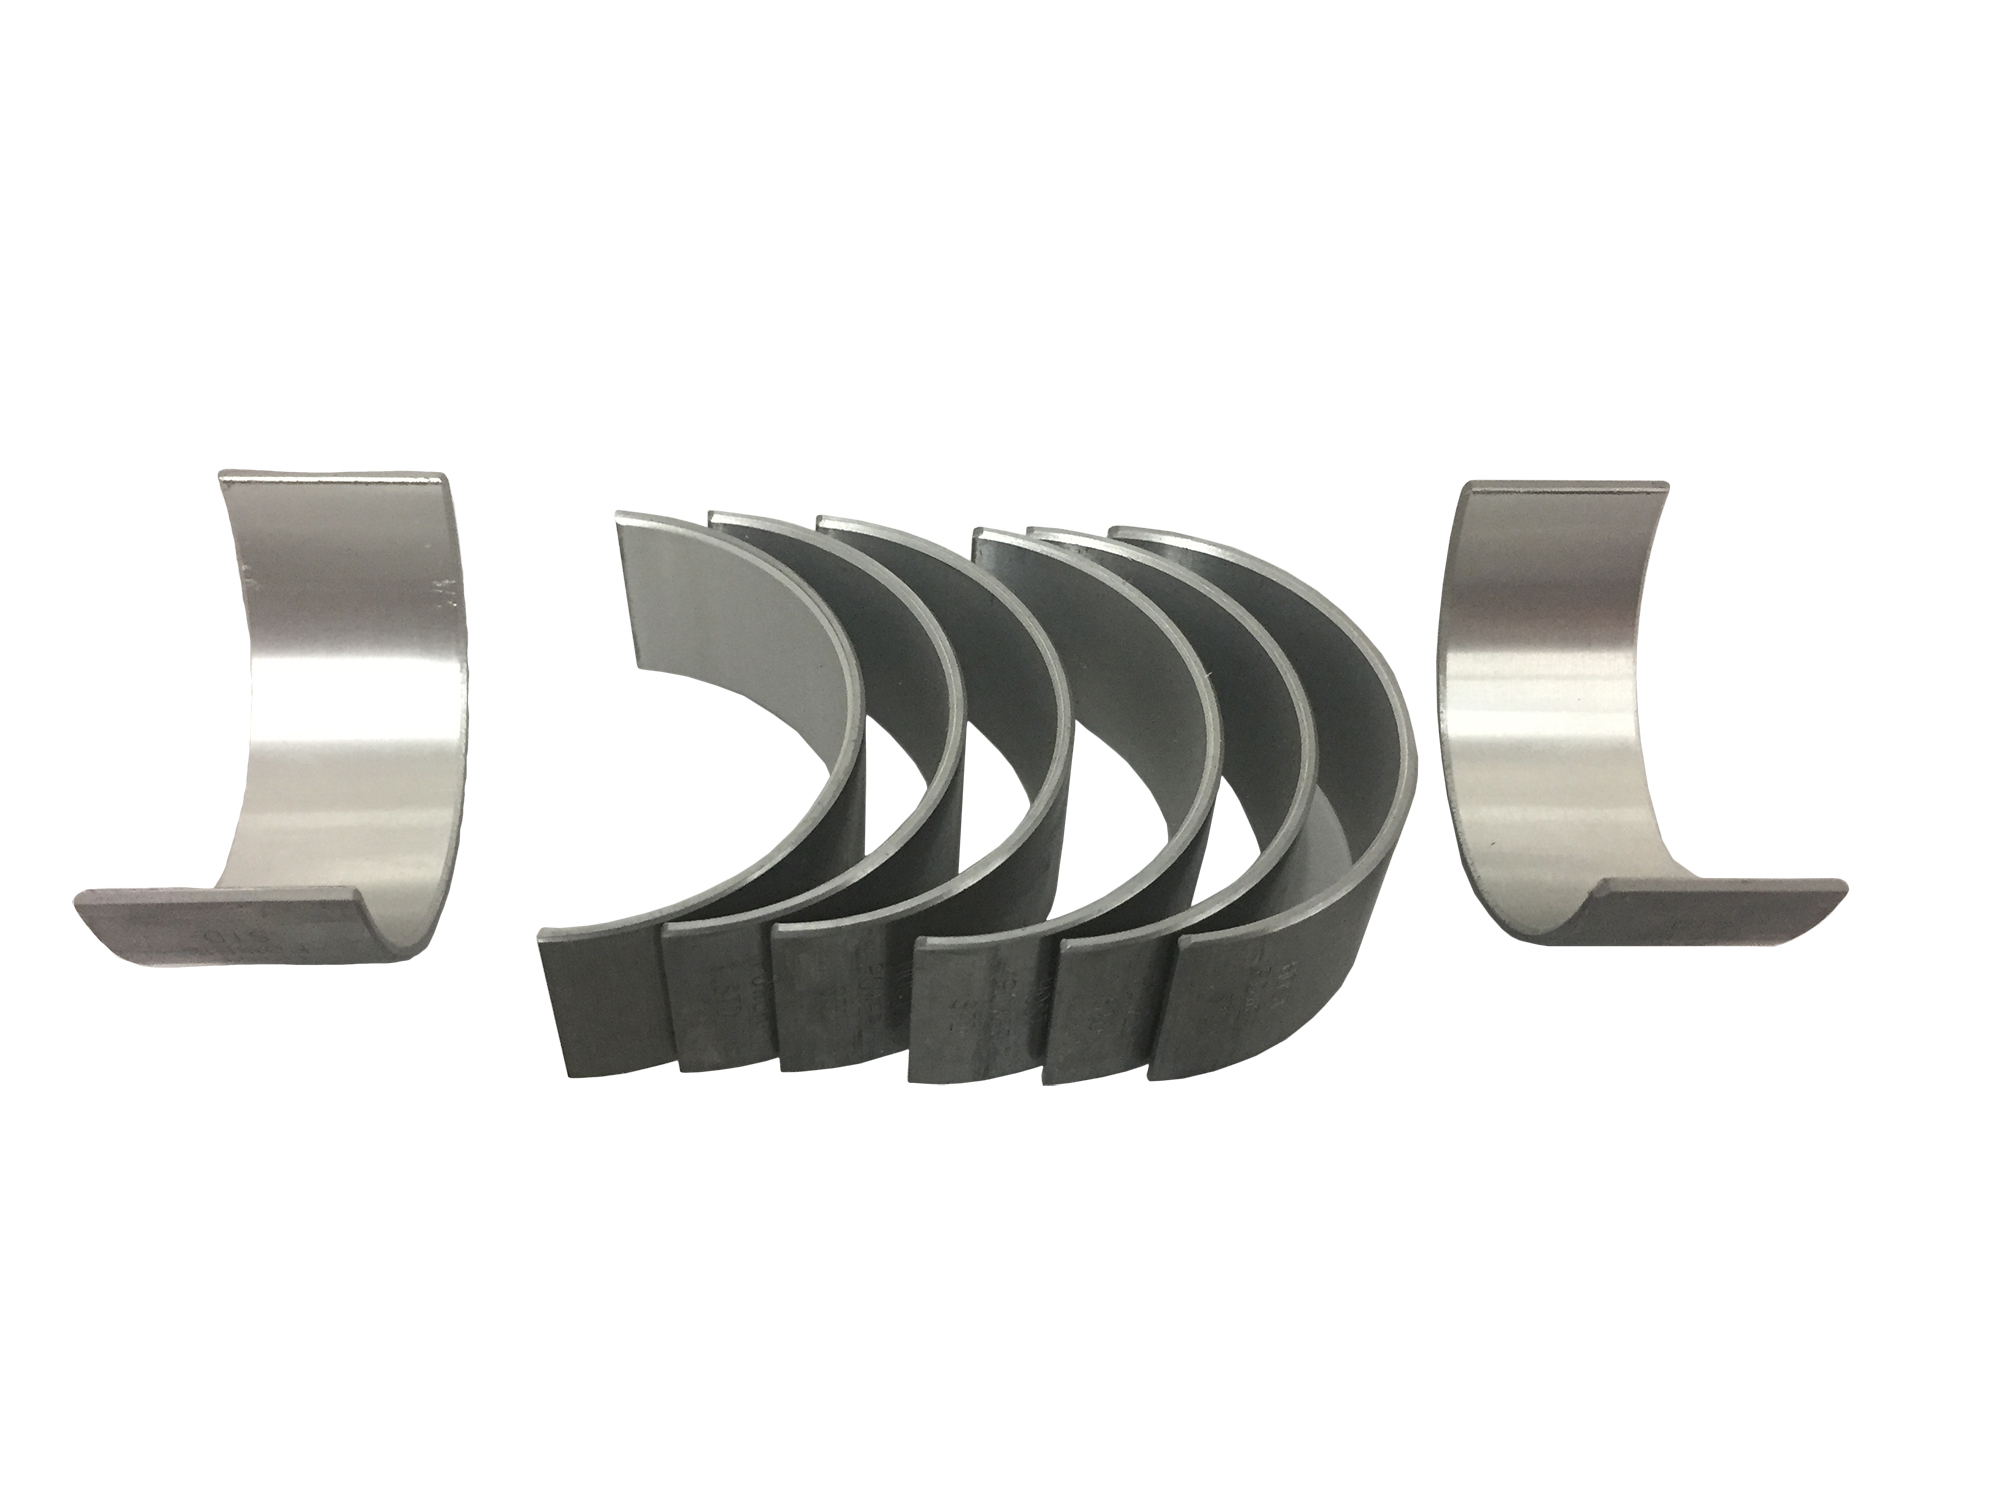 Pleuellagerschale Pleuellager Mini Cooper R56 1,6 N18B16A 11247586035 NEU